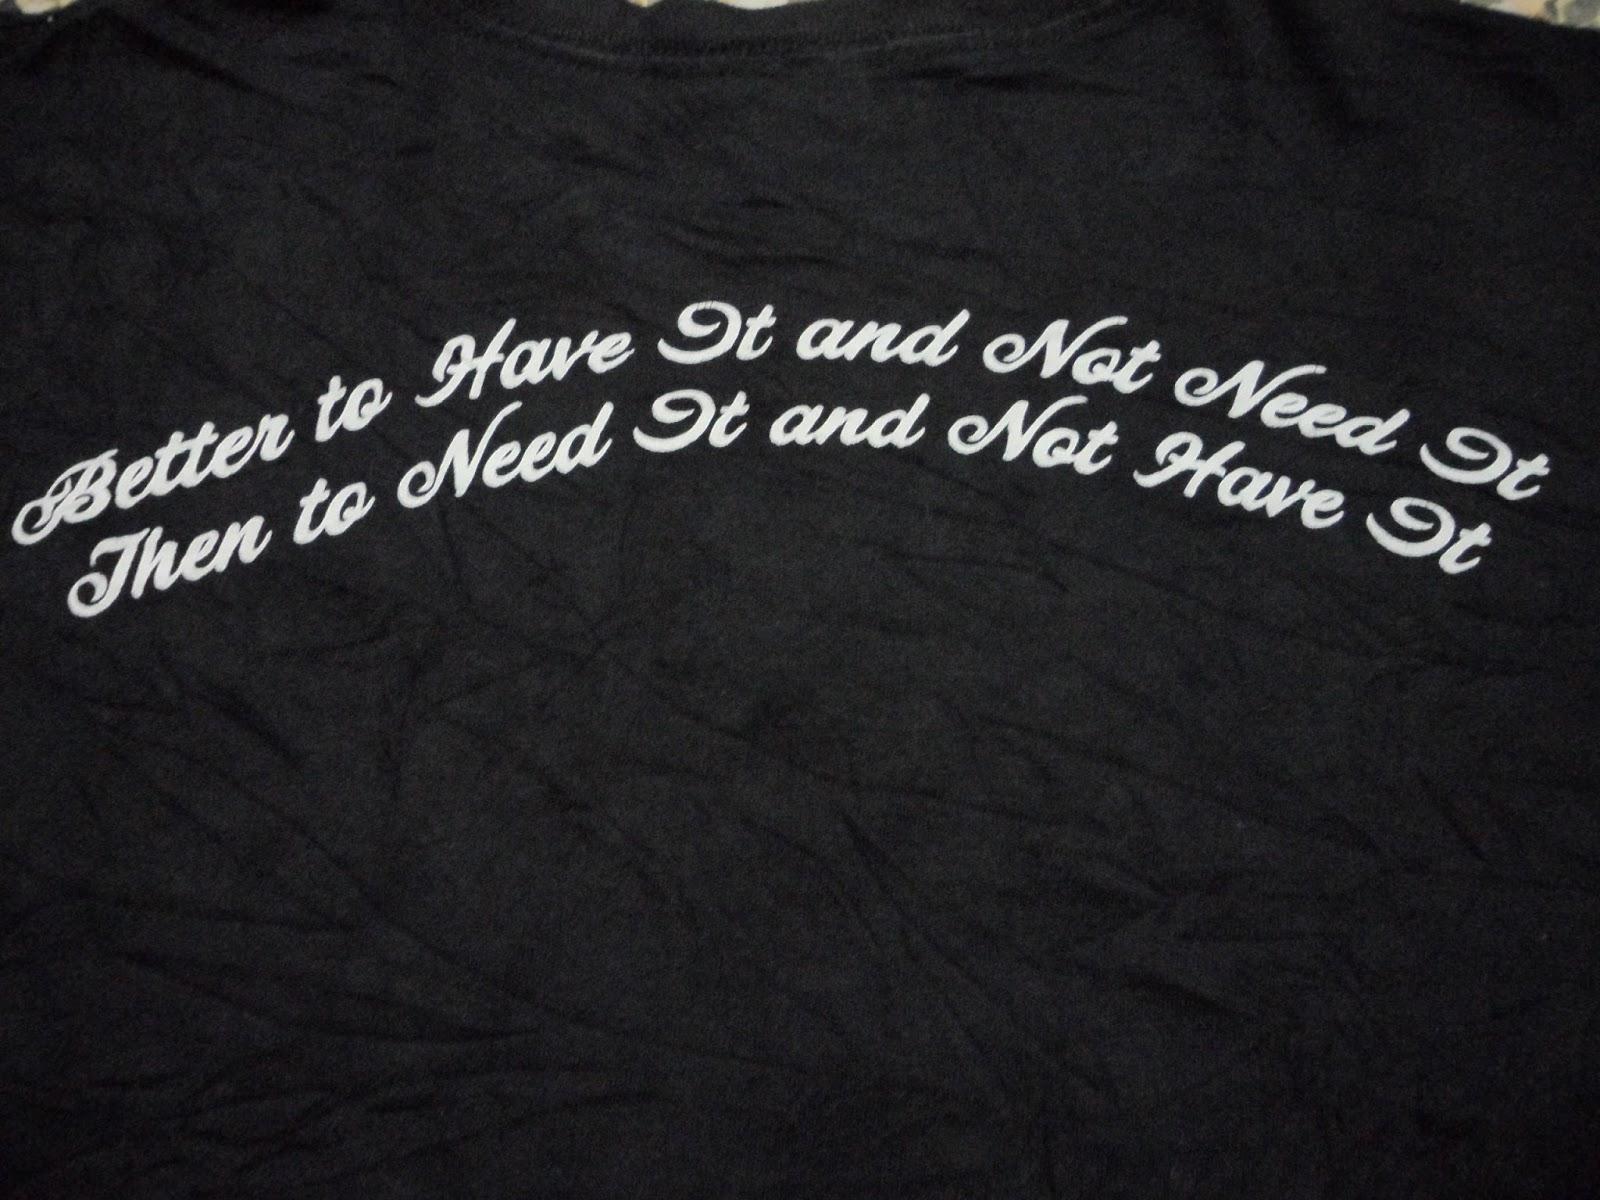 Clayback Bush Thrift Store T Shirt Air Gun By Crooks Castles SOLD